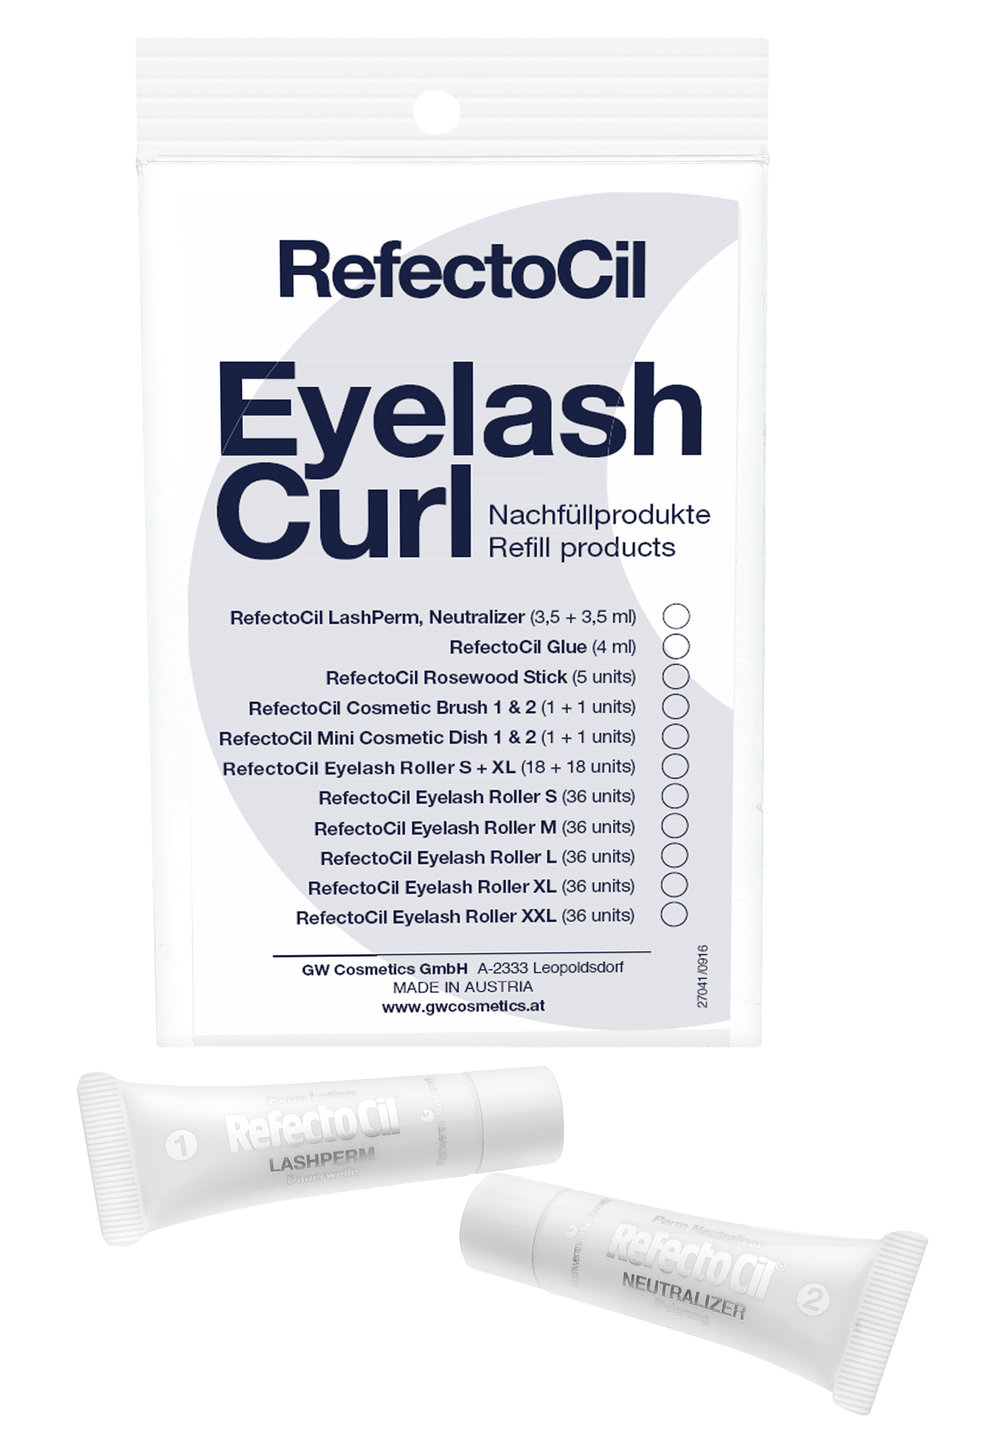 Eyelash Curl Refill - Perm/Neutralizer